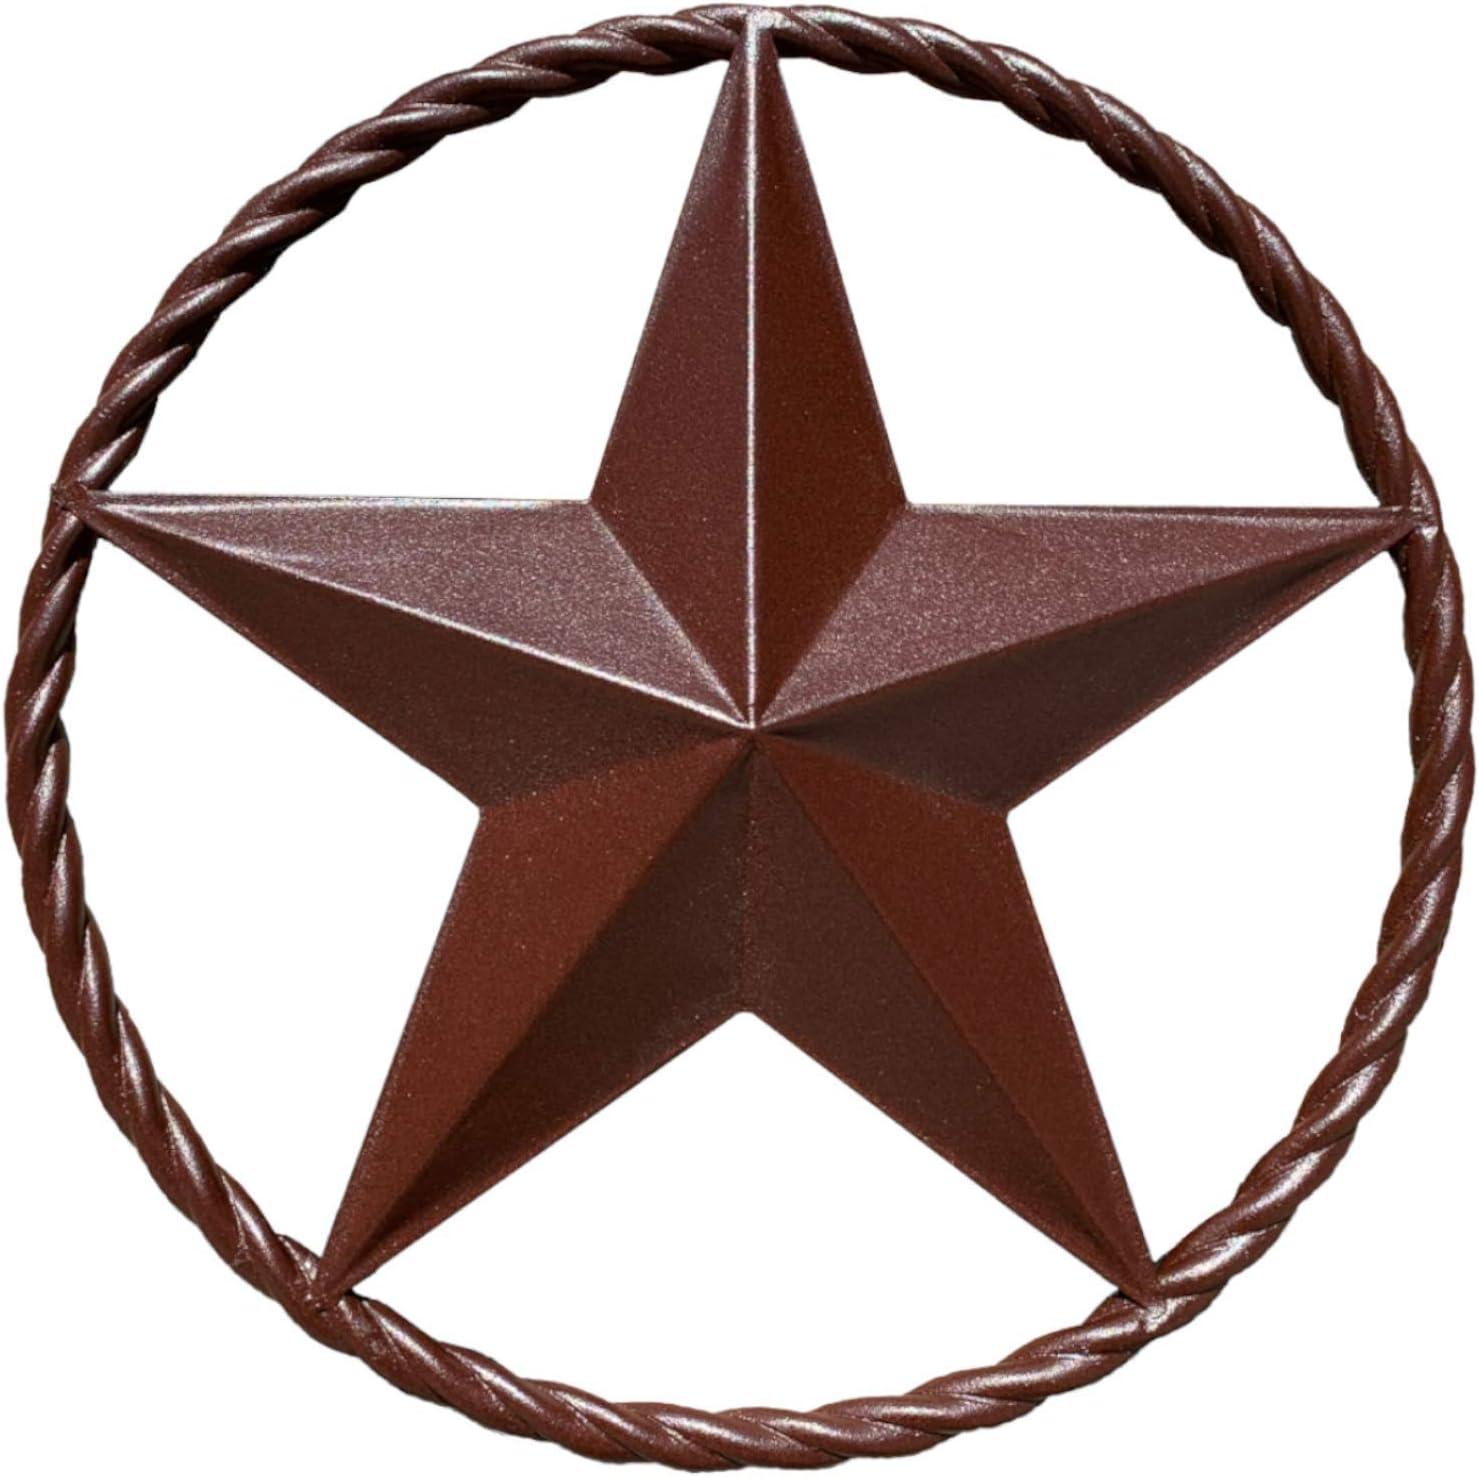 EcoRise Barn Star - Metal Stars for Outside Texas Stars Art Rustic Vintage Western Country Home Farmhouse Wall Decor (12